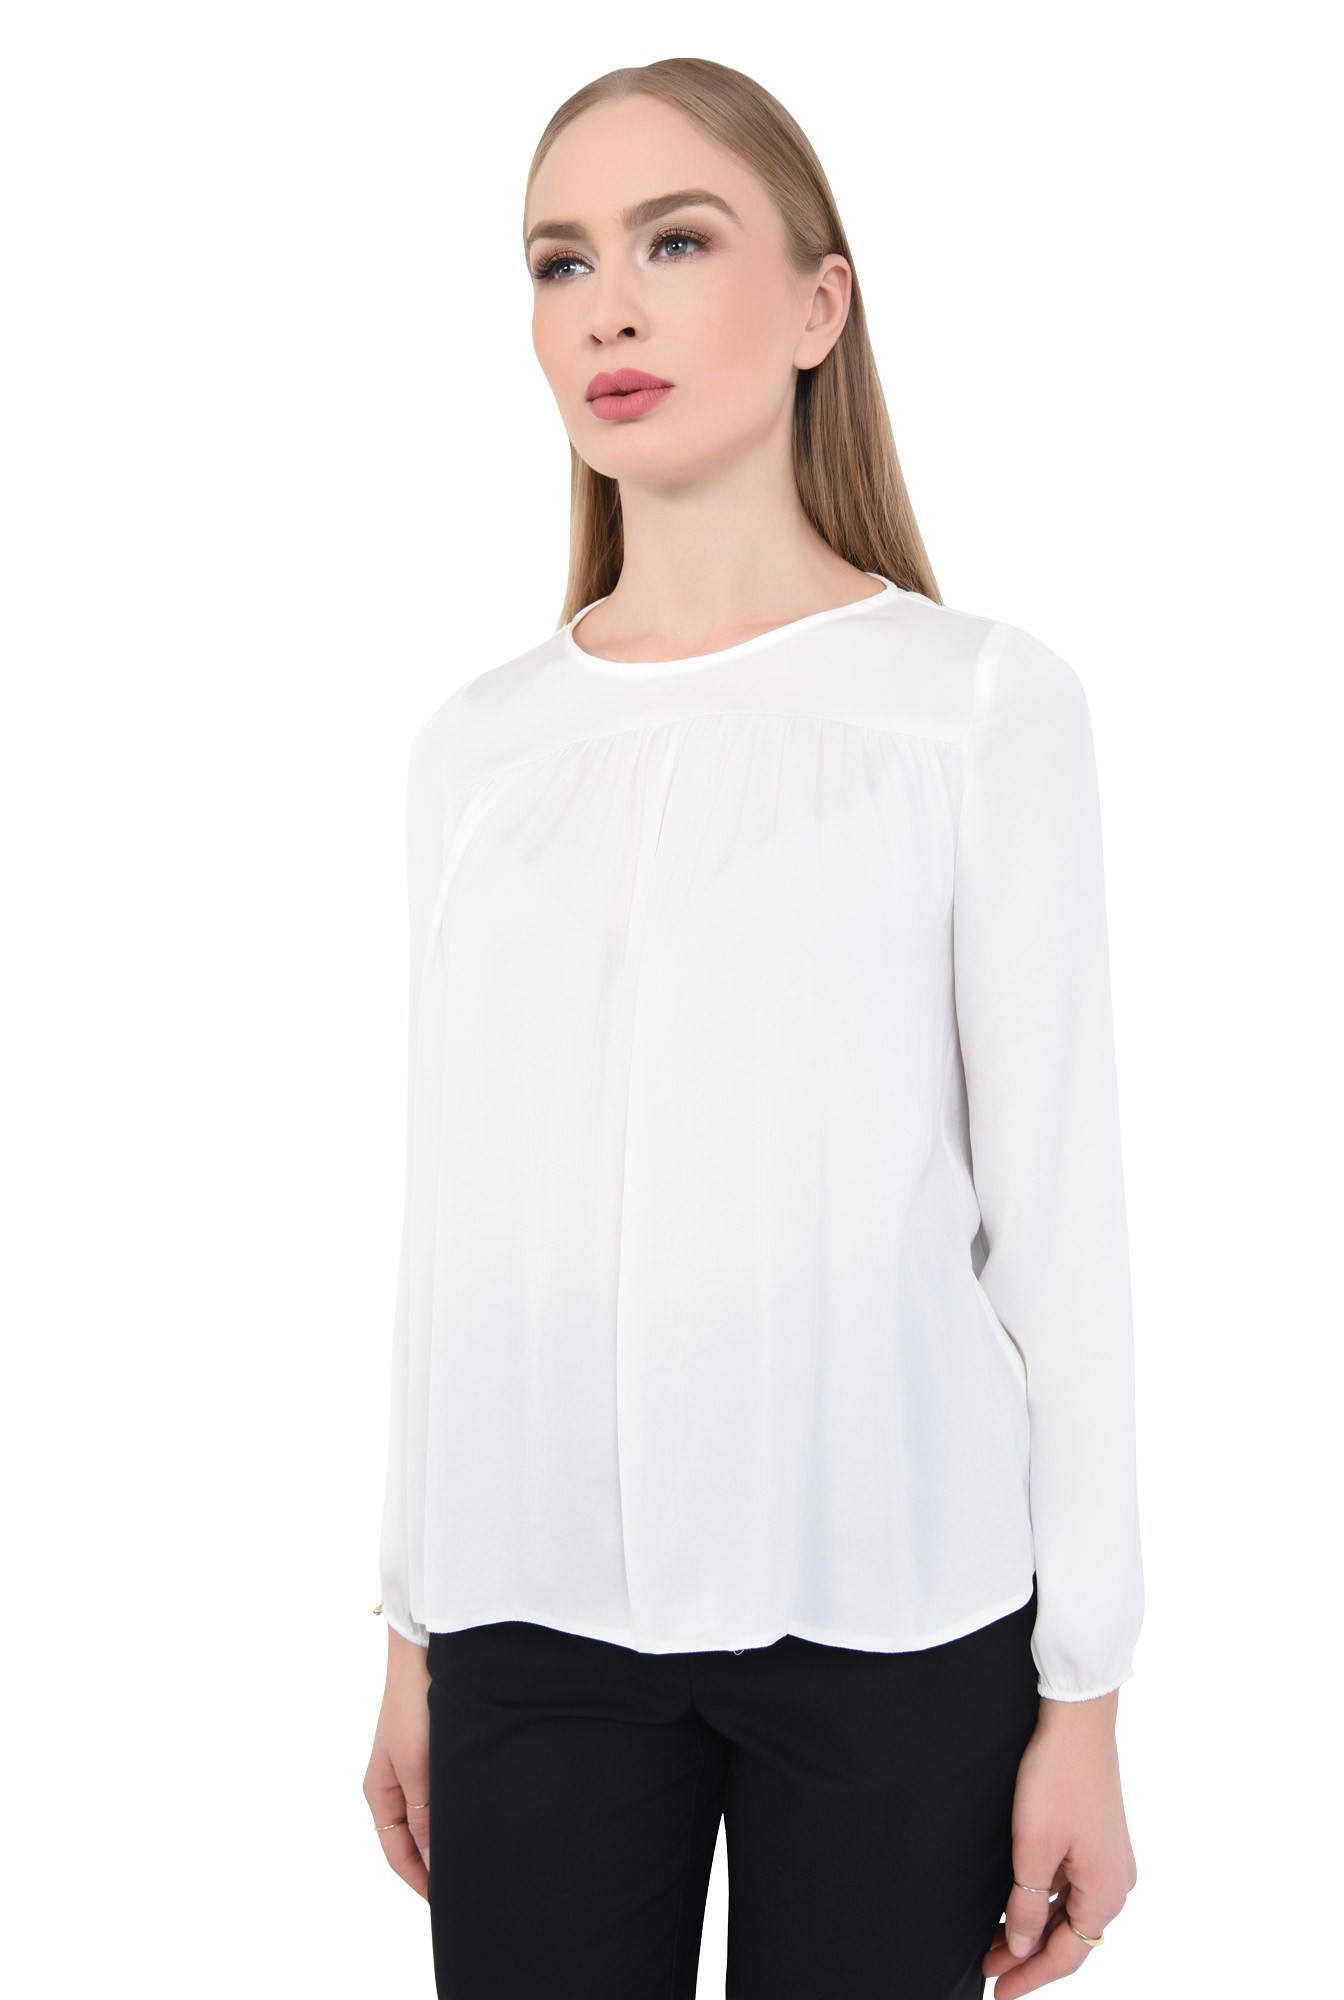 2 - Bluza eleganta, vaporoasa, decolteu rotund